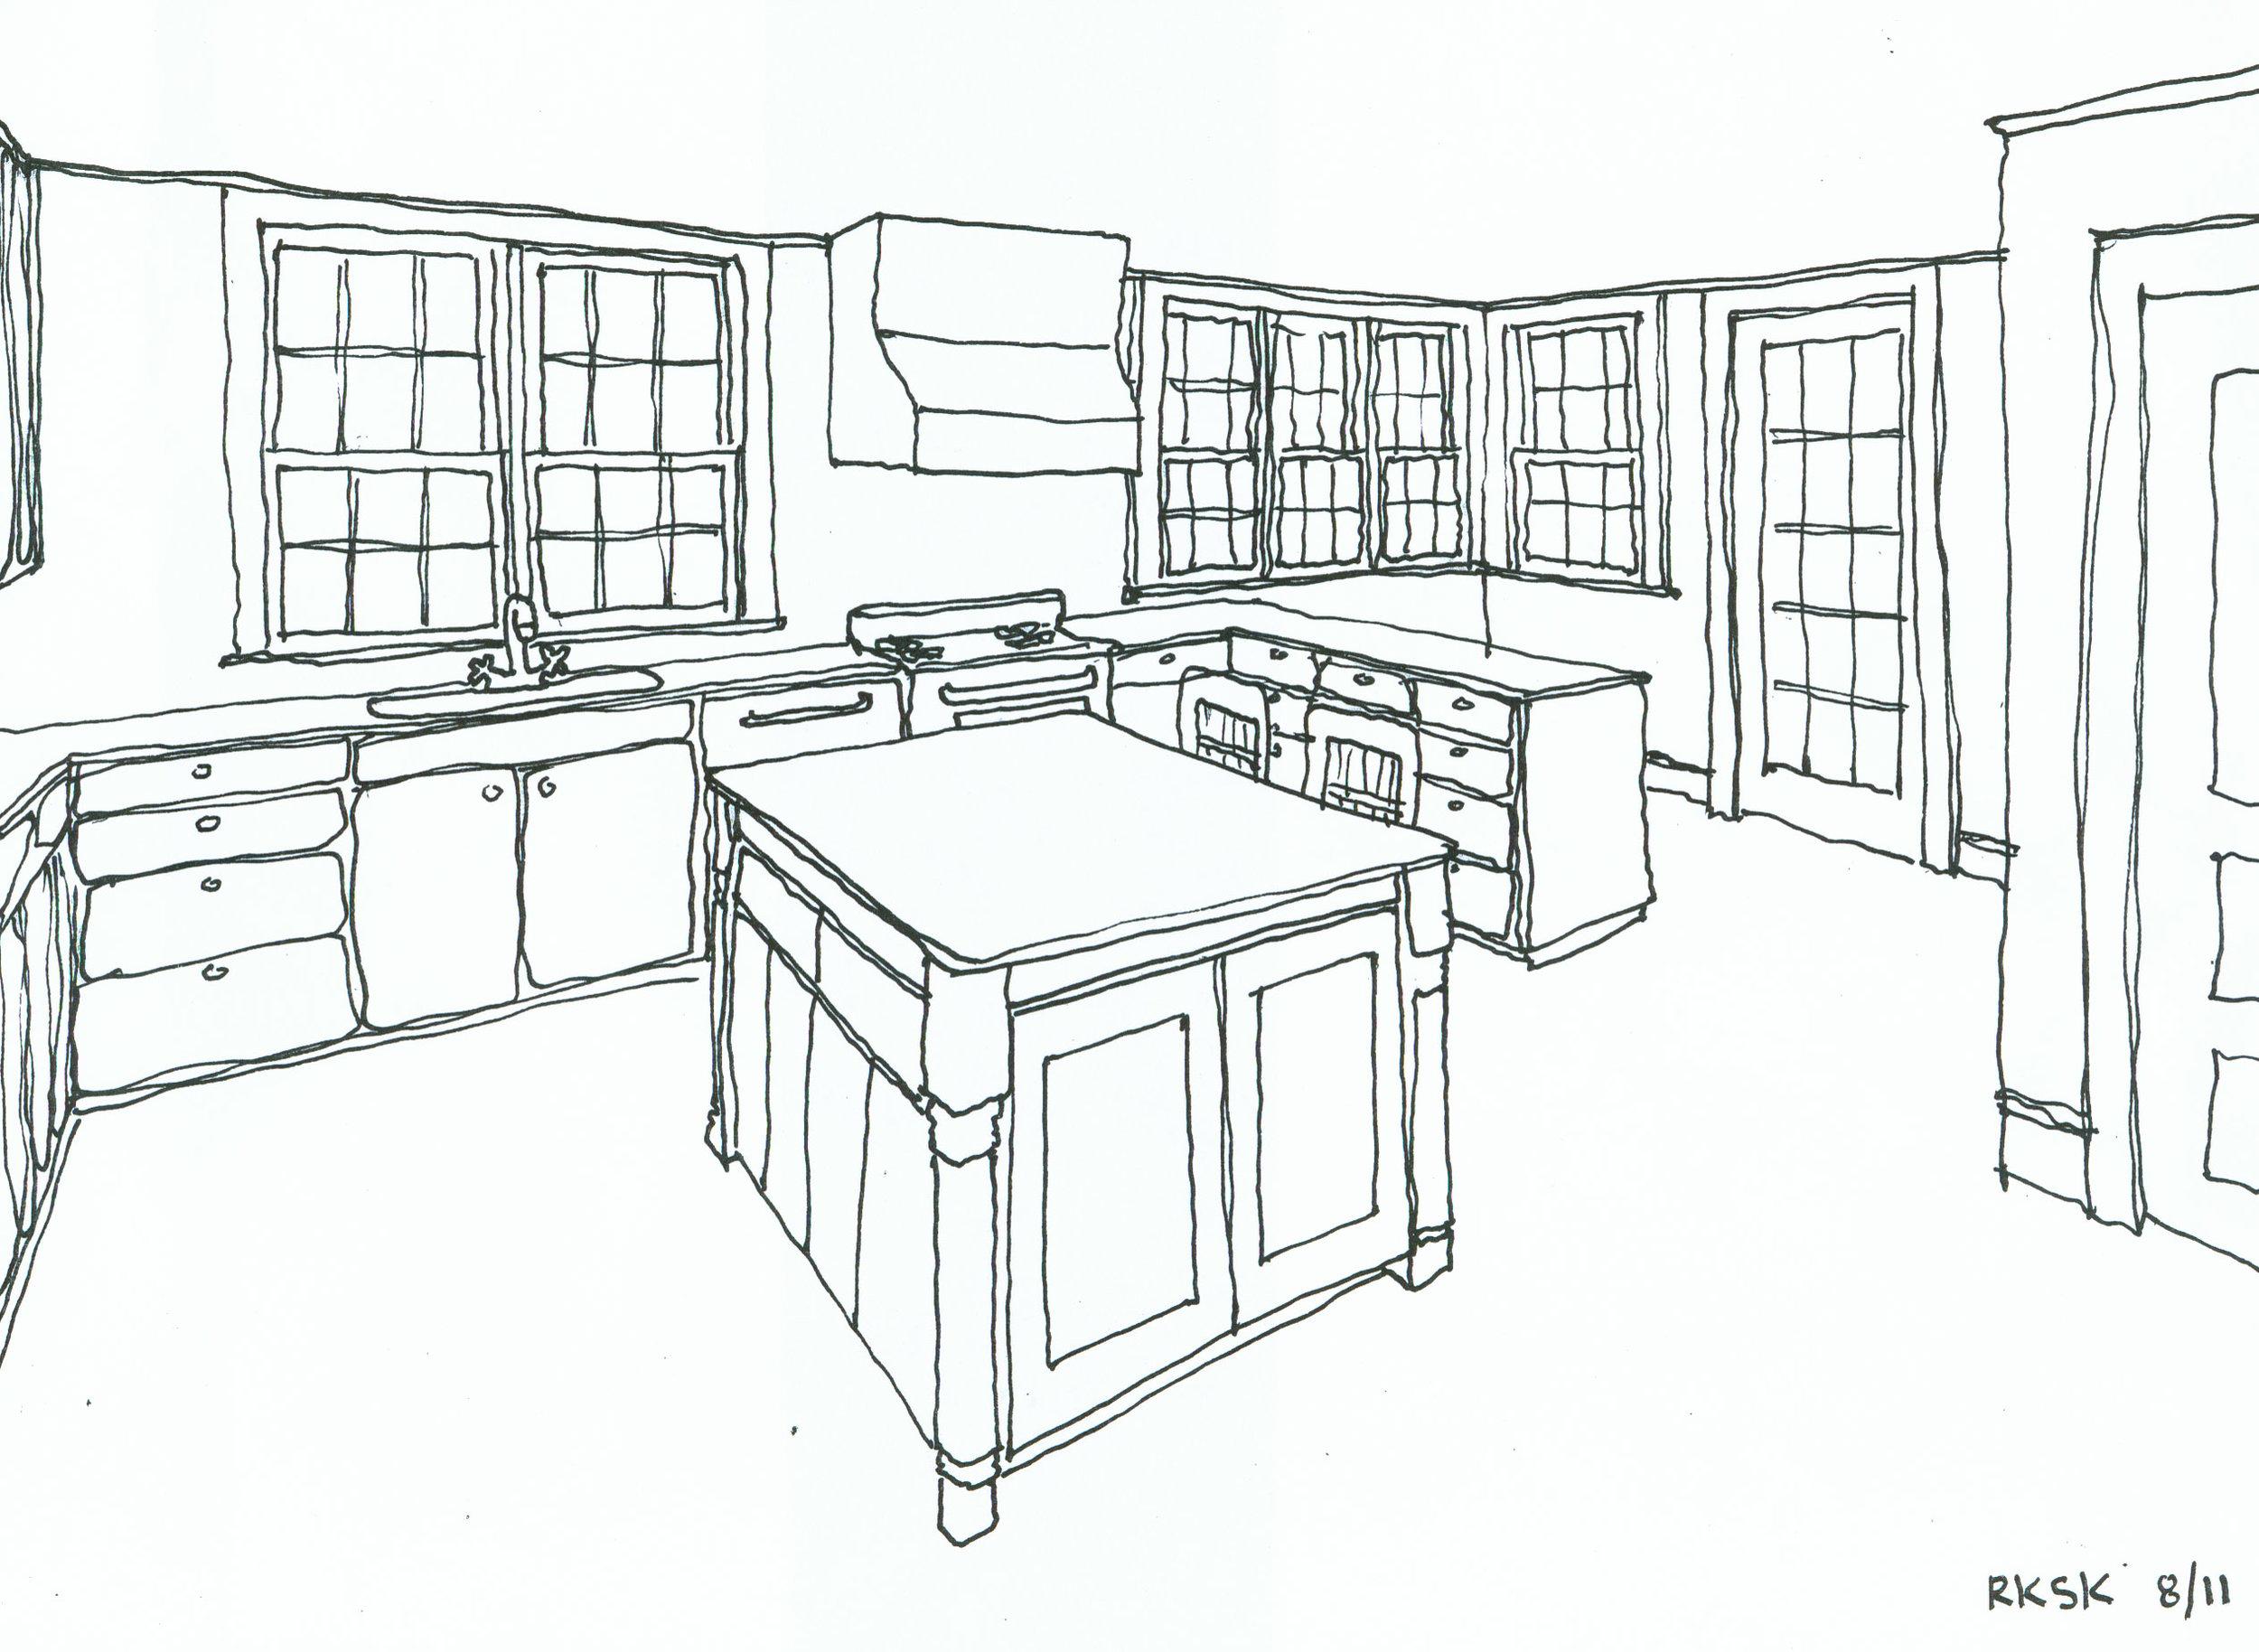 rksk-pd-r3 kitchen perpctv R2.jpg